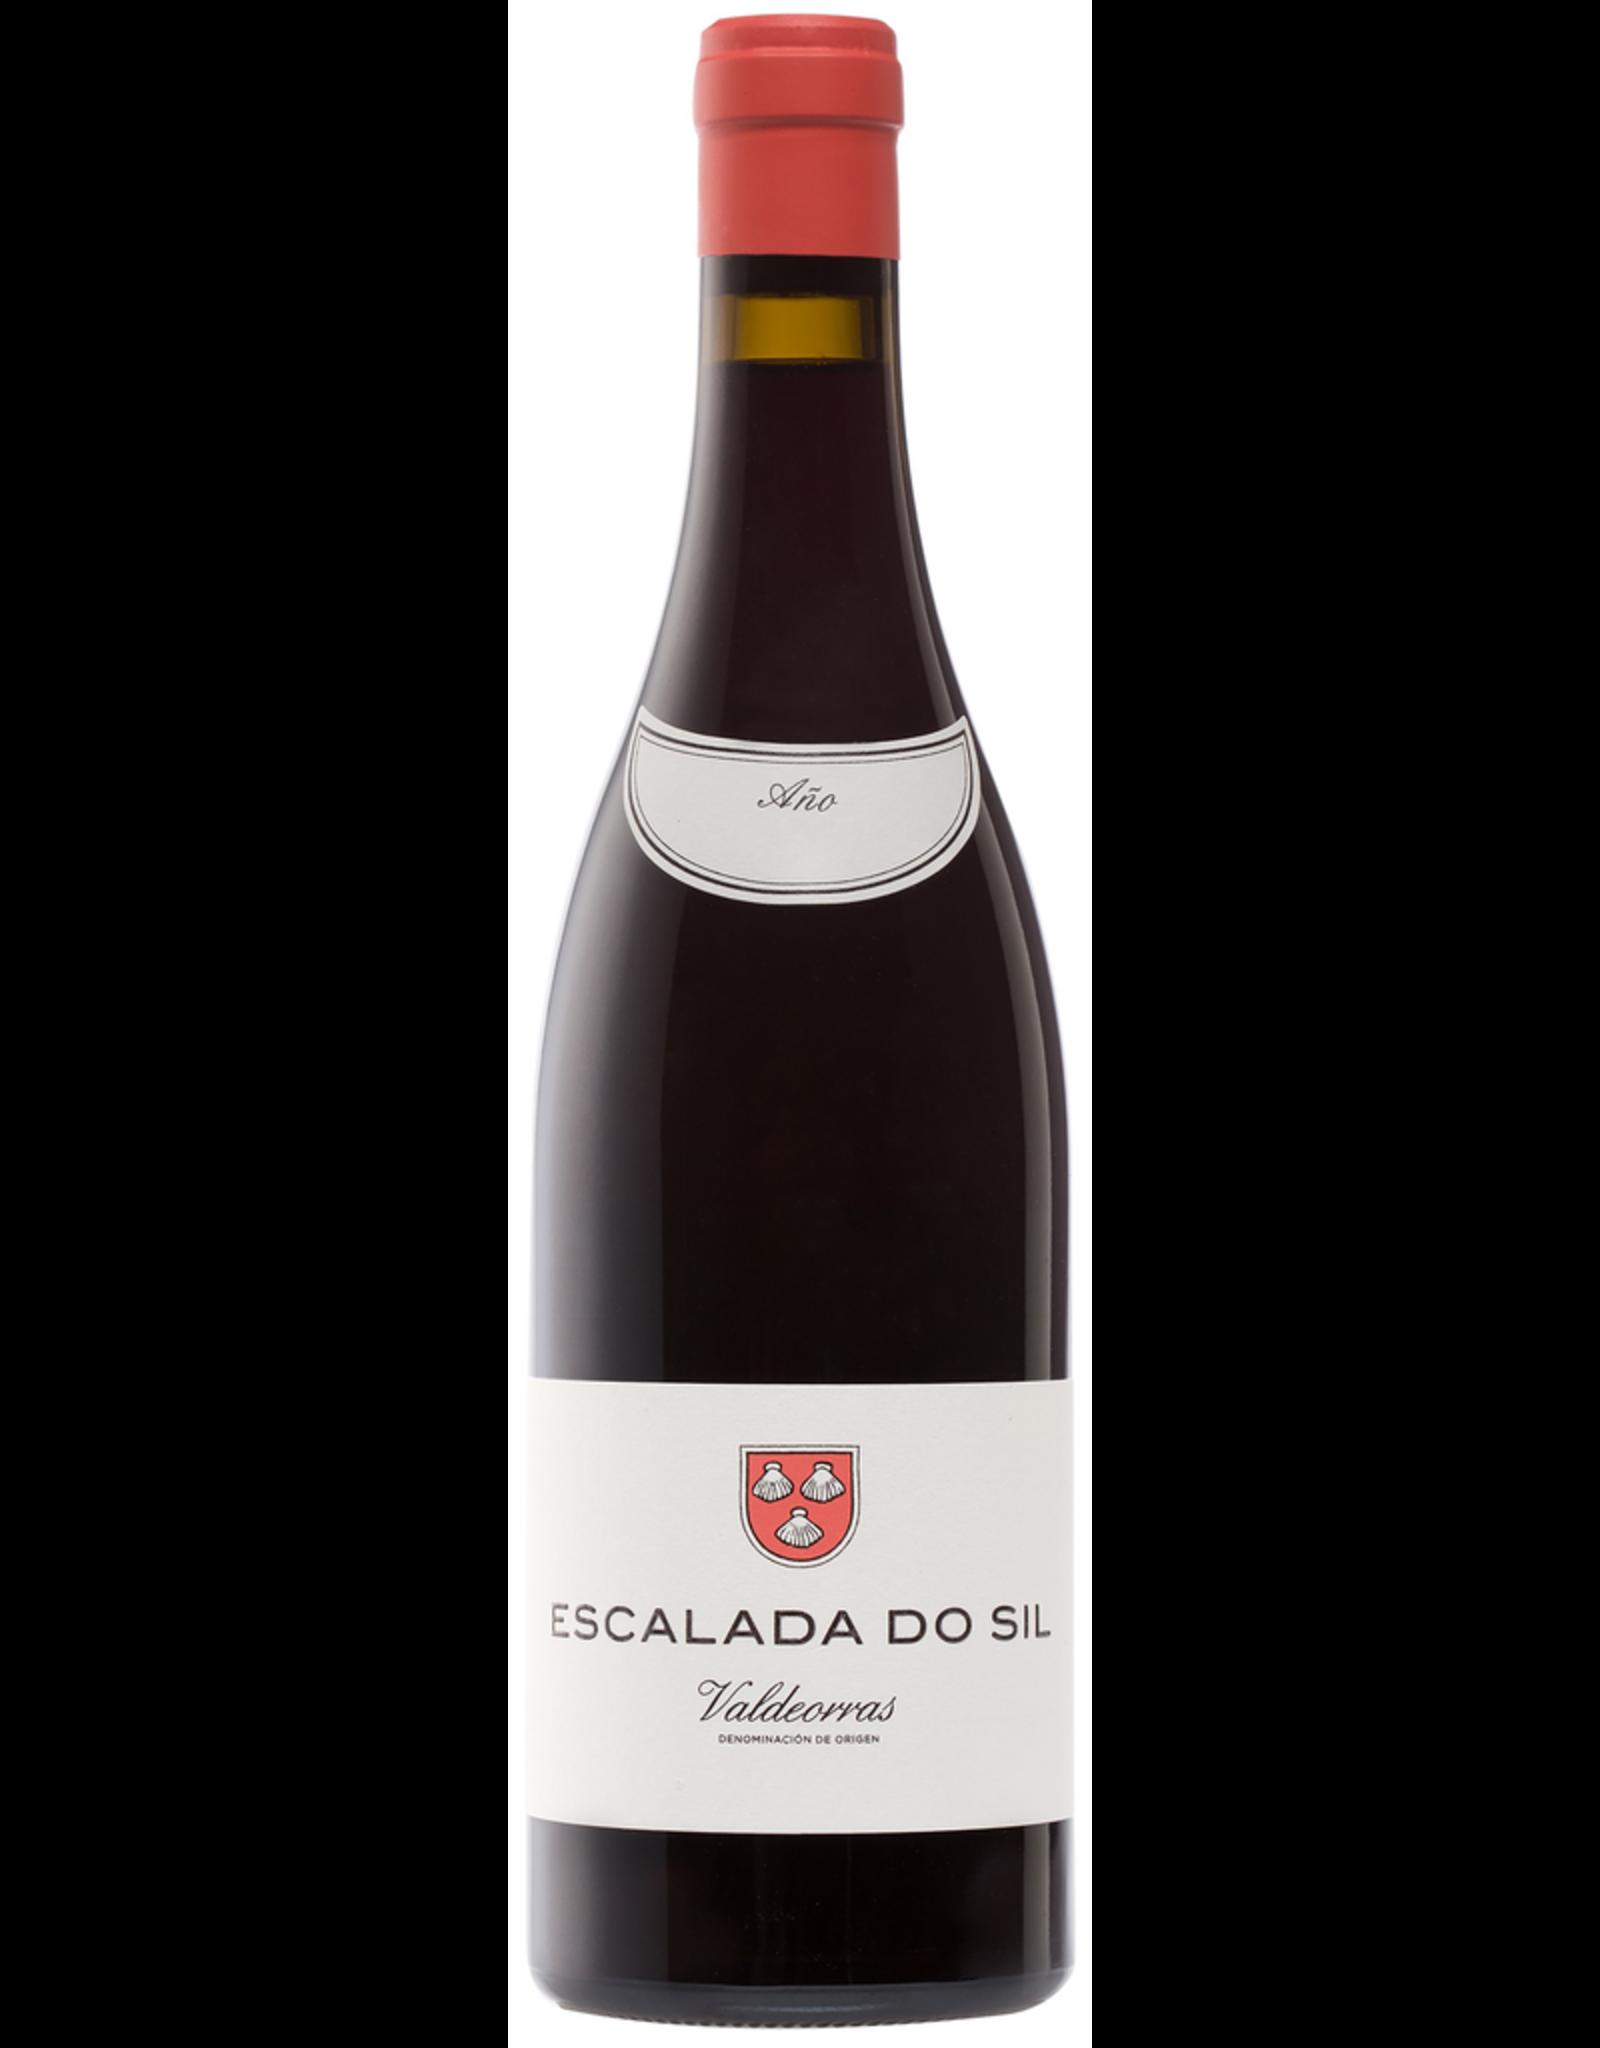 Red Wine 2016, Escalada Do Sil by Alberto Orte, Merenzao Mencia Garnacha Rare Red Blend, Valdeorras, Galicia, Spain, 13.5% Alc, CTnr, JS93